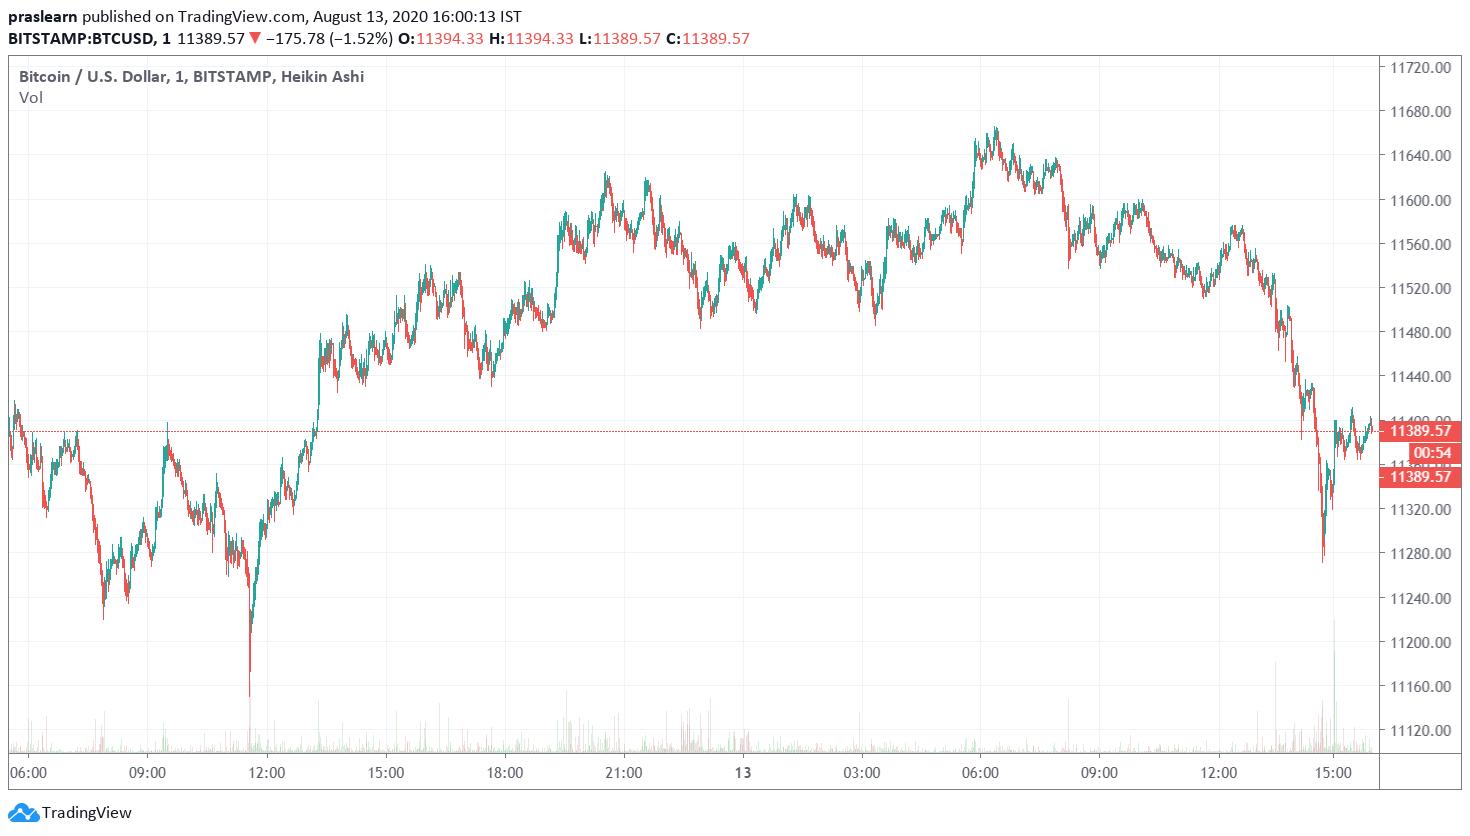 Bitcoin Price Analysis of 1 Day: BTC/USD 1 Day Chart: Tradingview